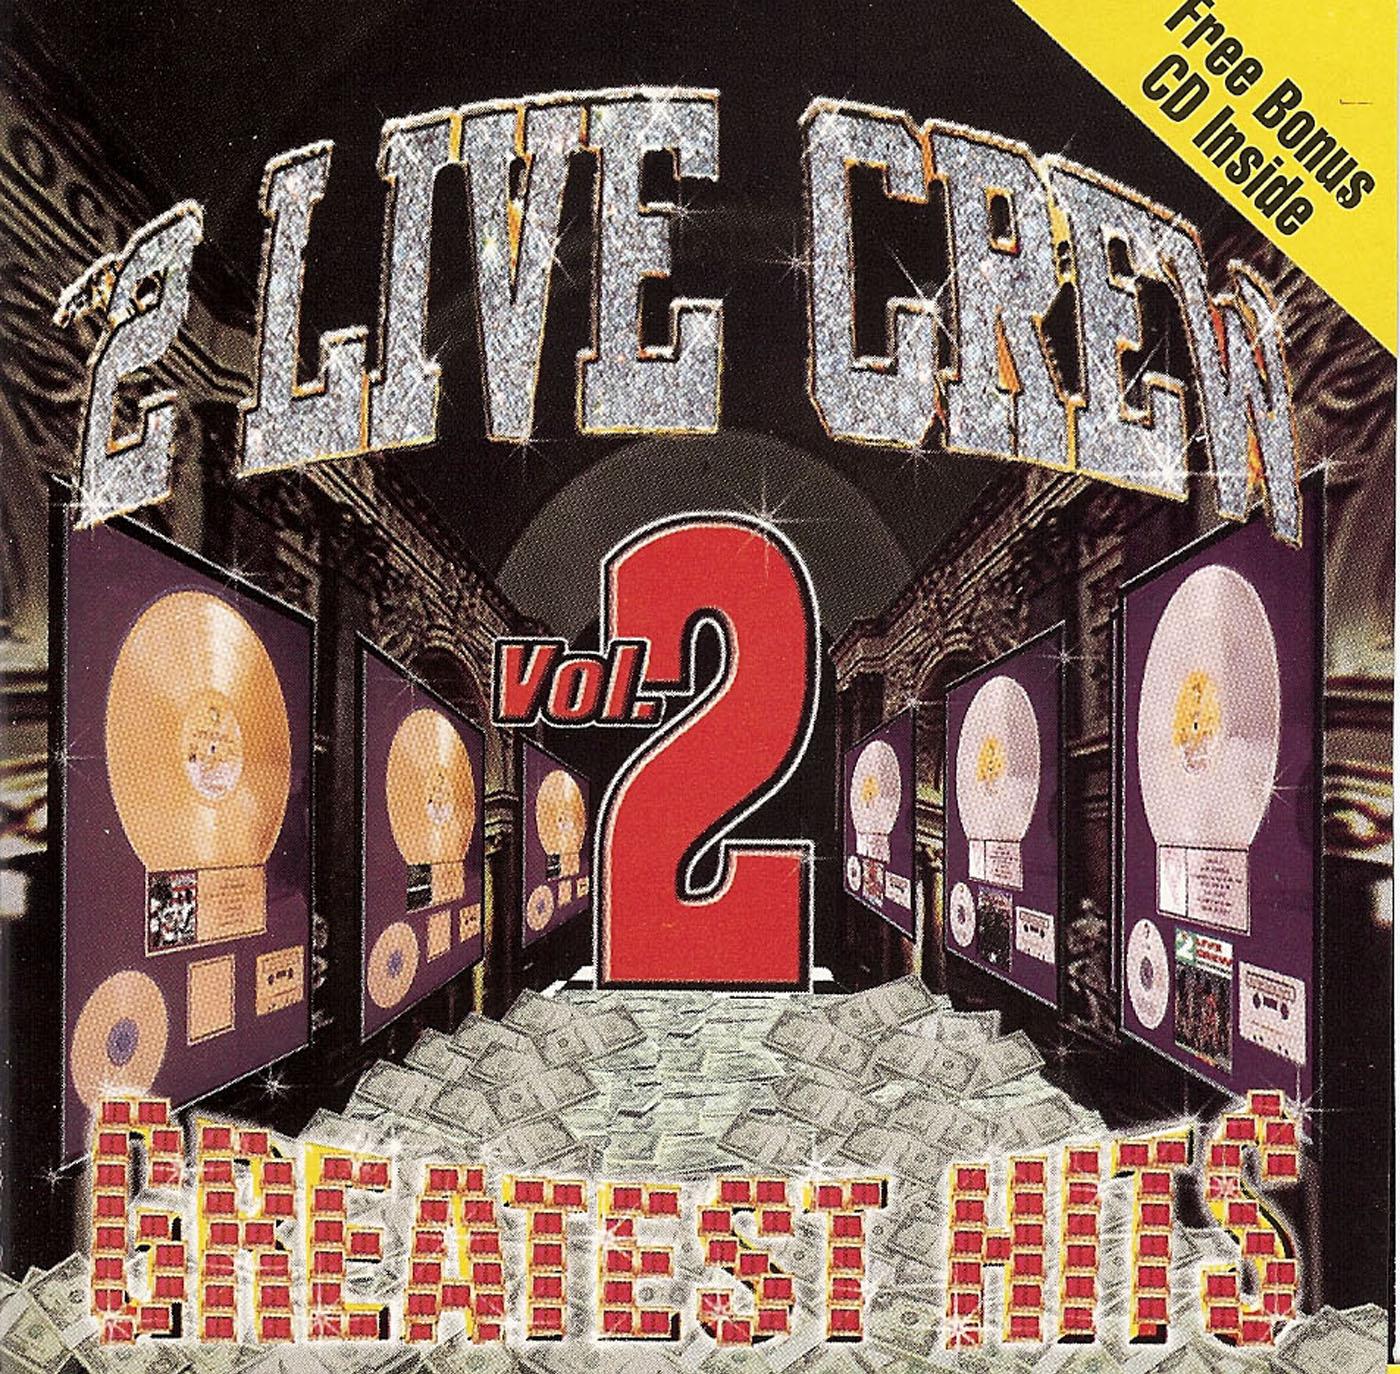 2 Live Crew Greatest Hits Vol 2nÇóCleannÇó2 Live Crew